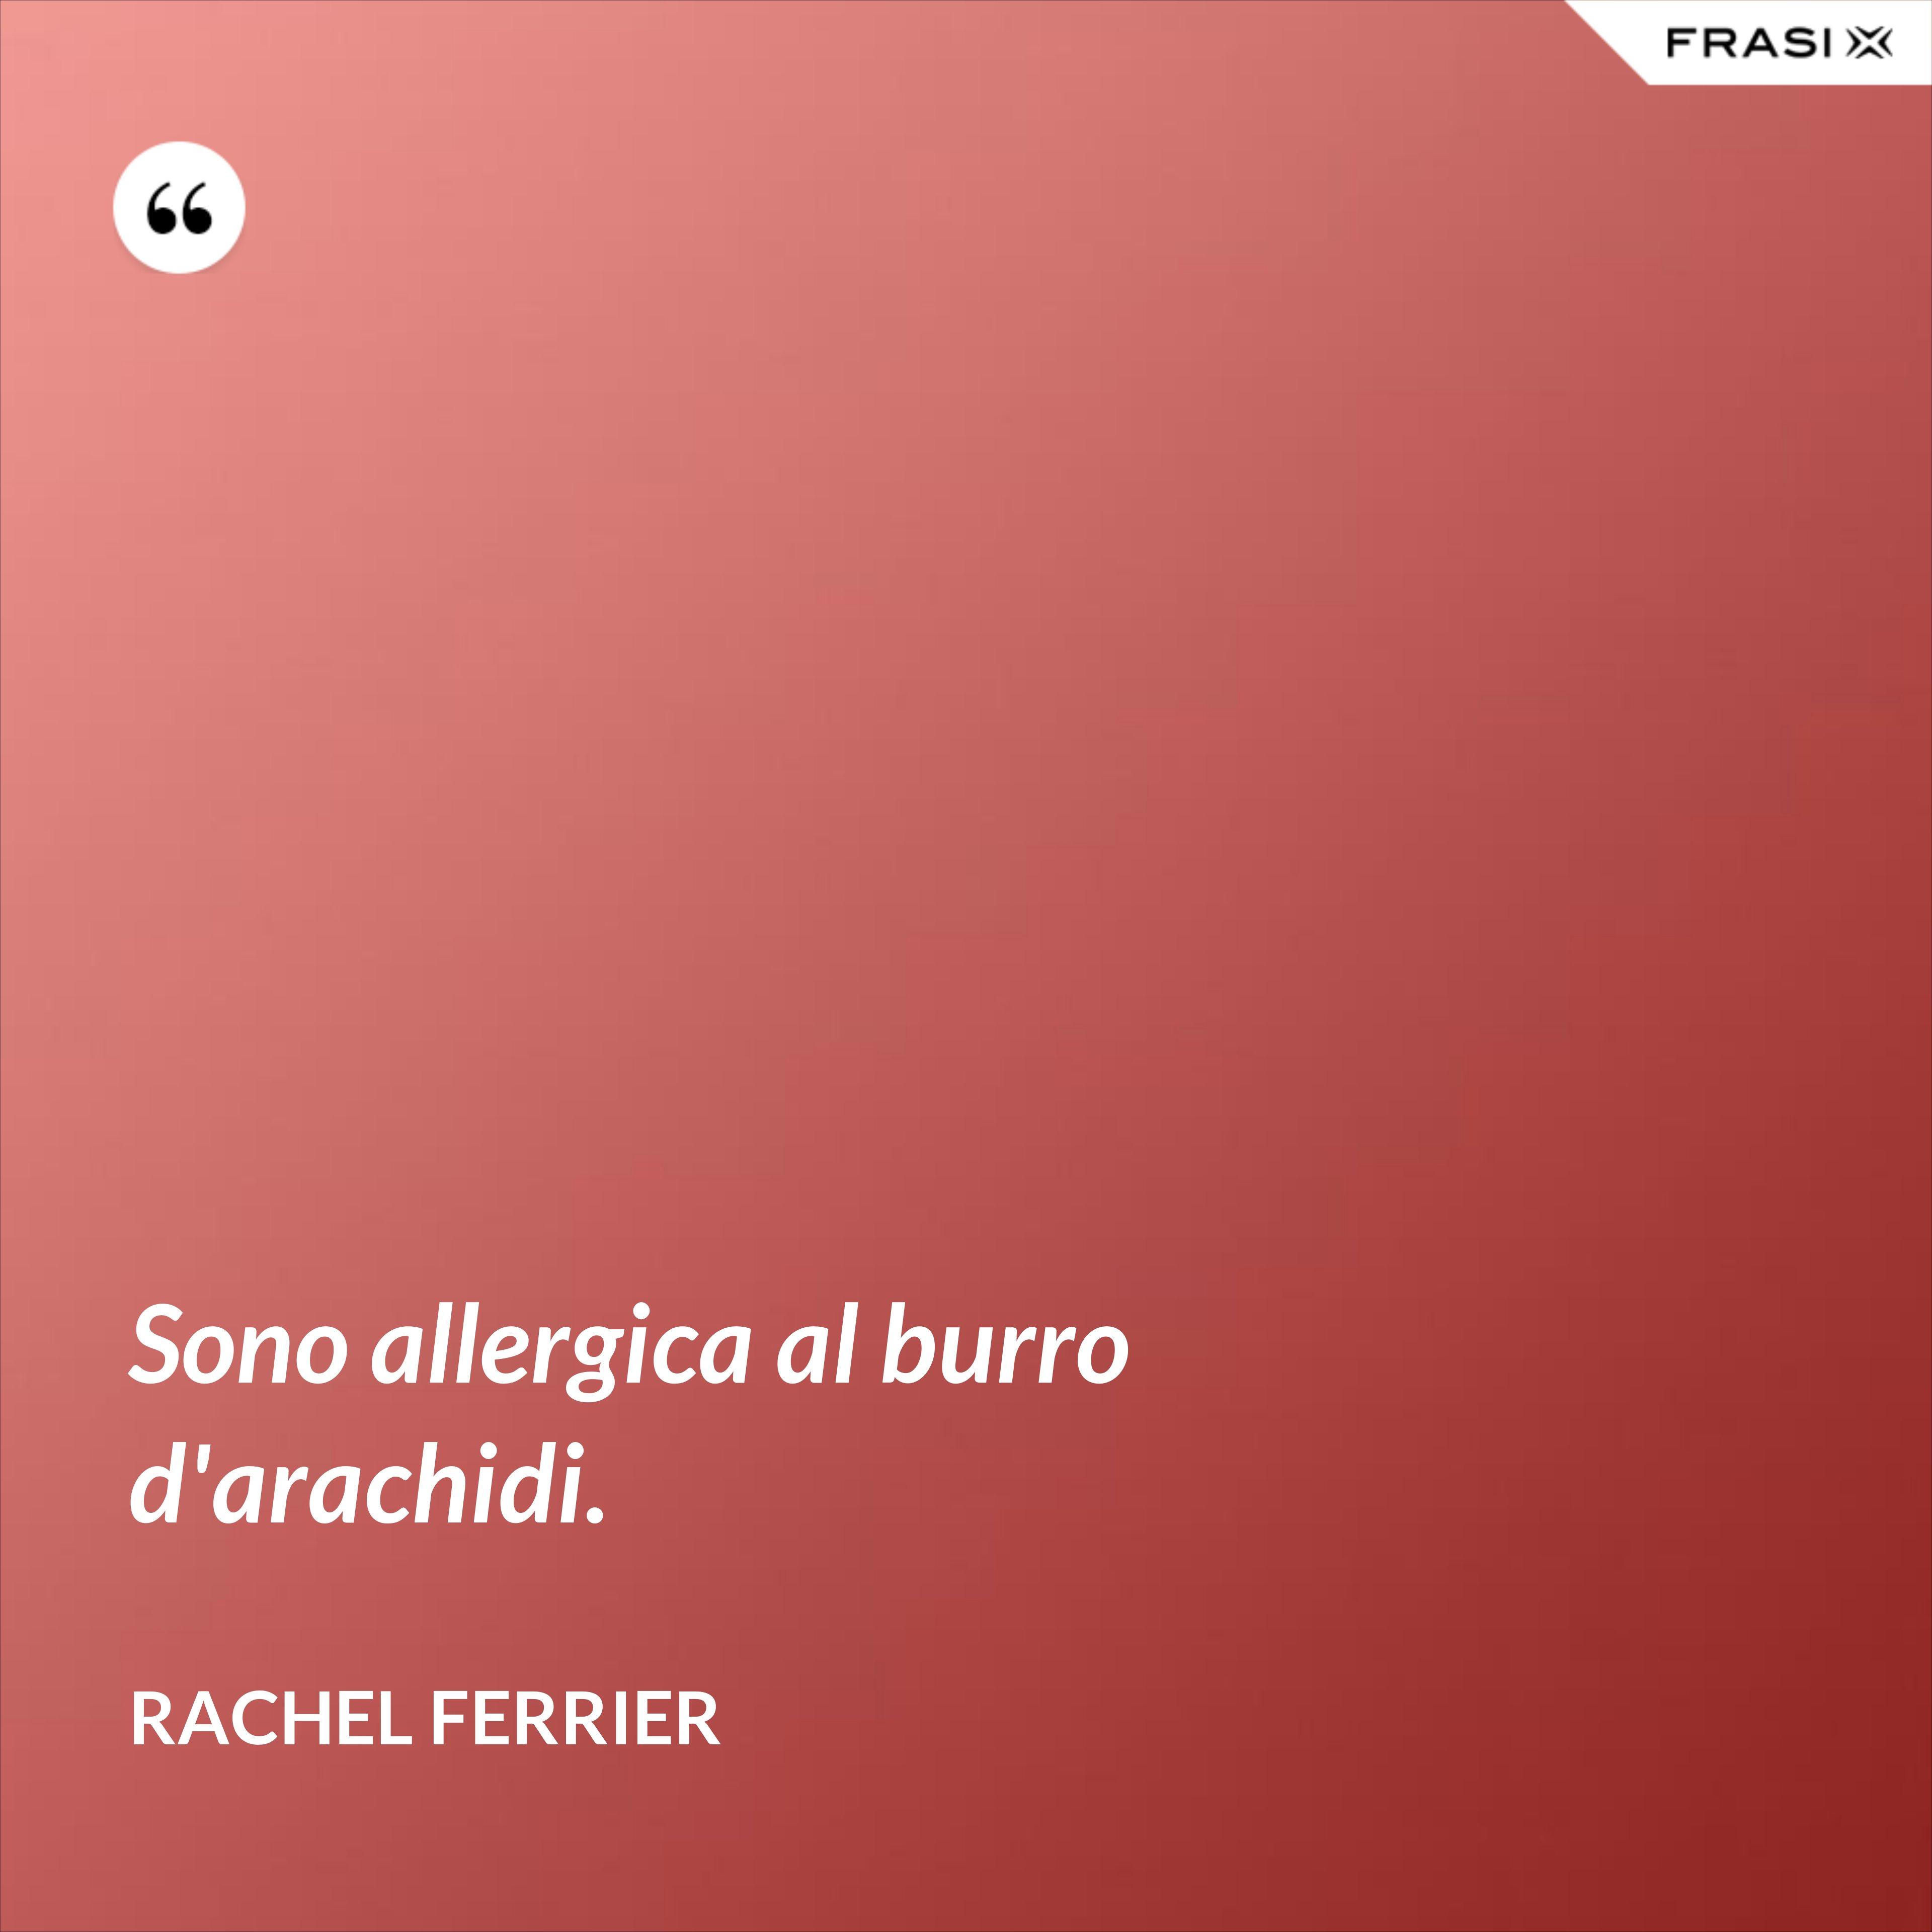 Sono allergica al burro d'arachidi. - Rachel Ferrier